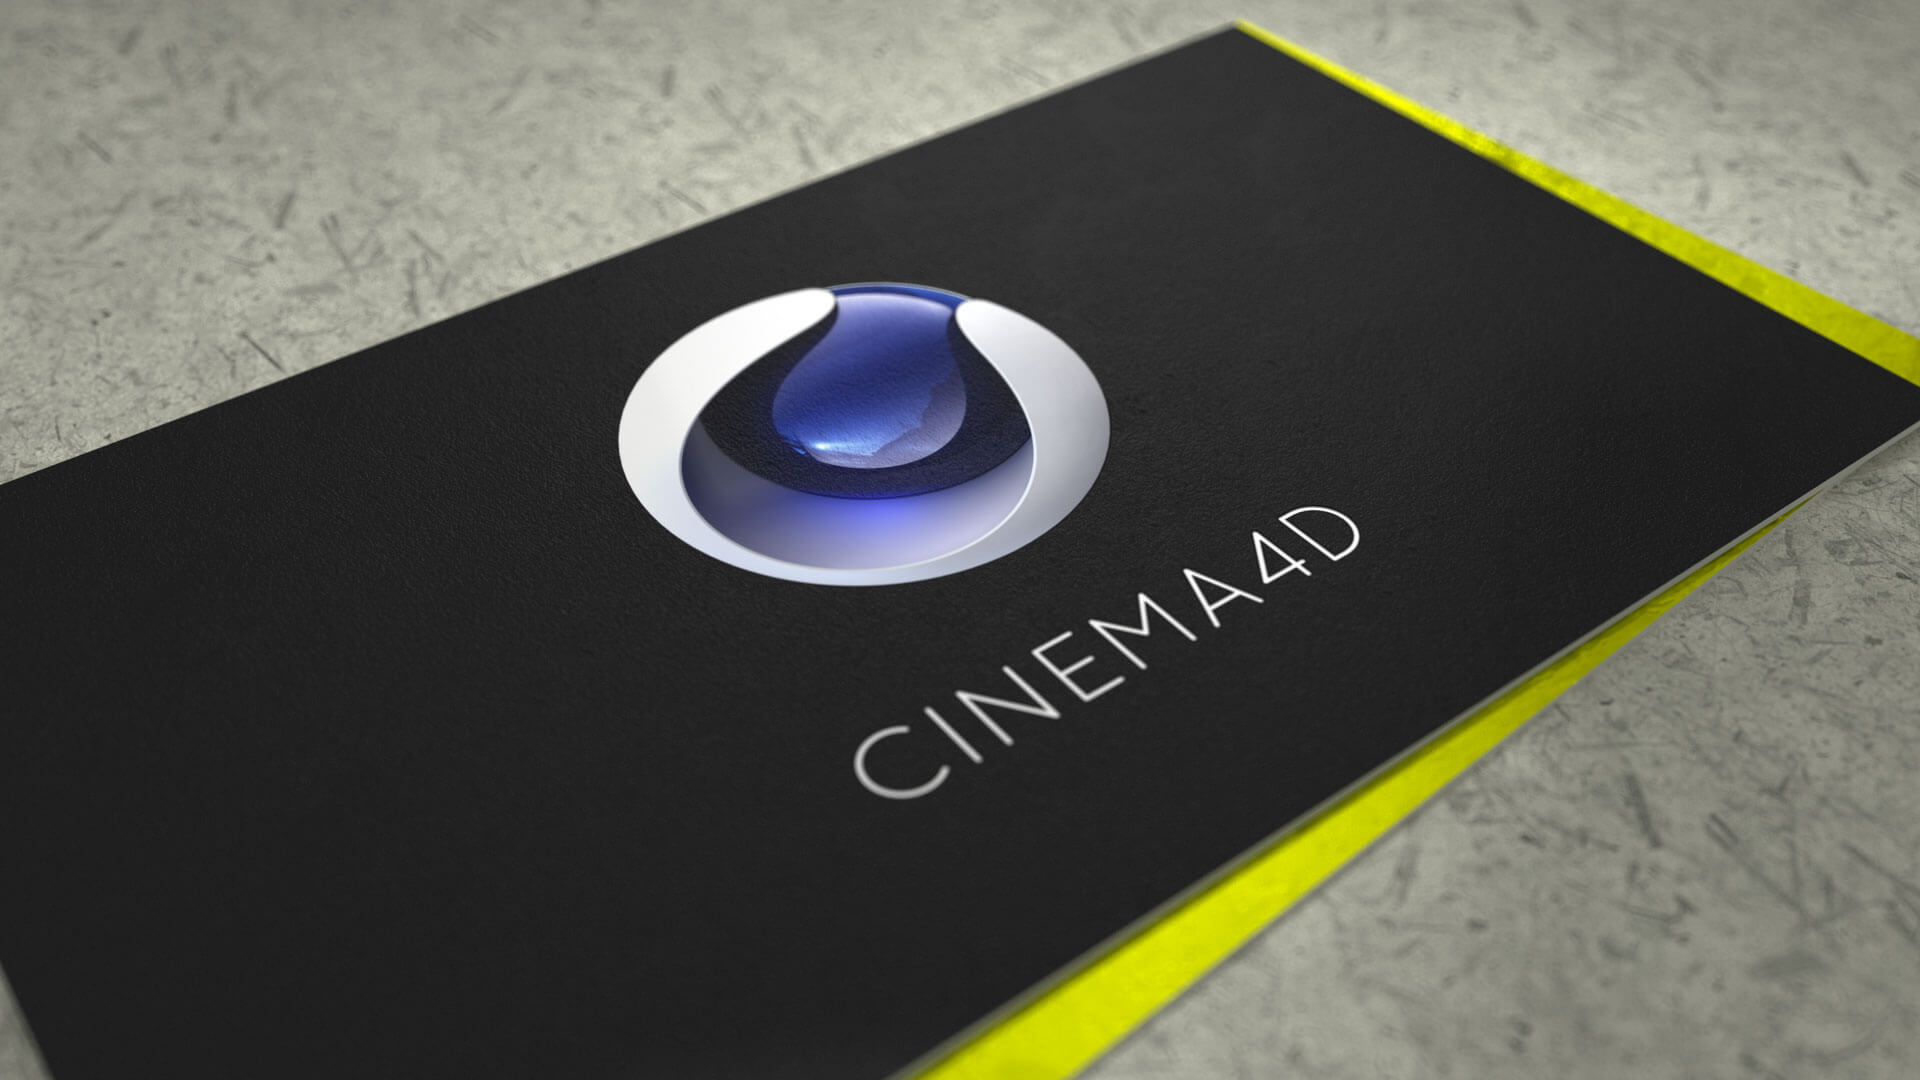 Cinema 4D R21.115 Full Crack Free Download 64 bit